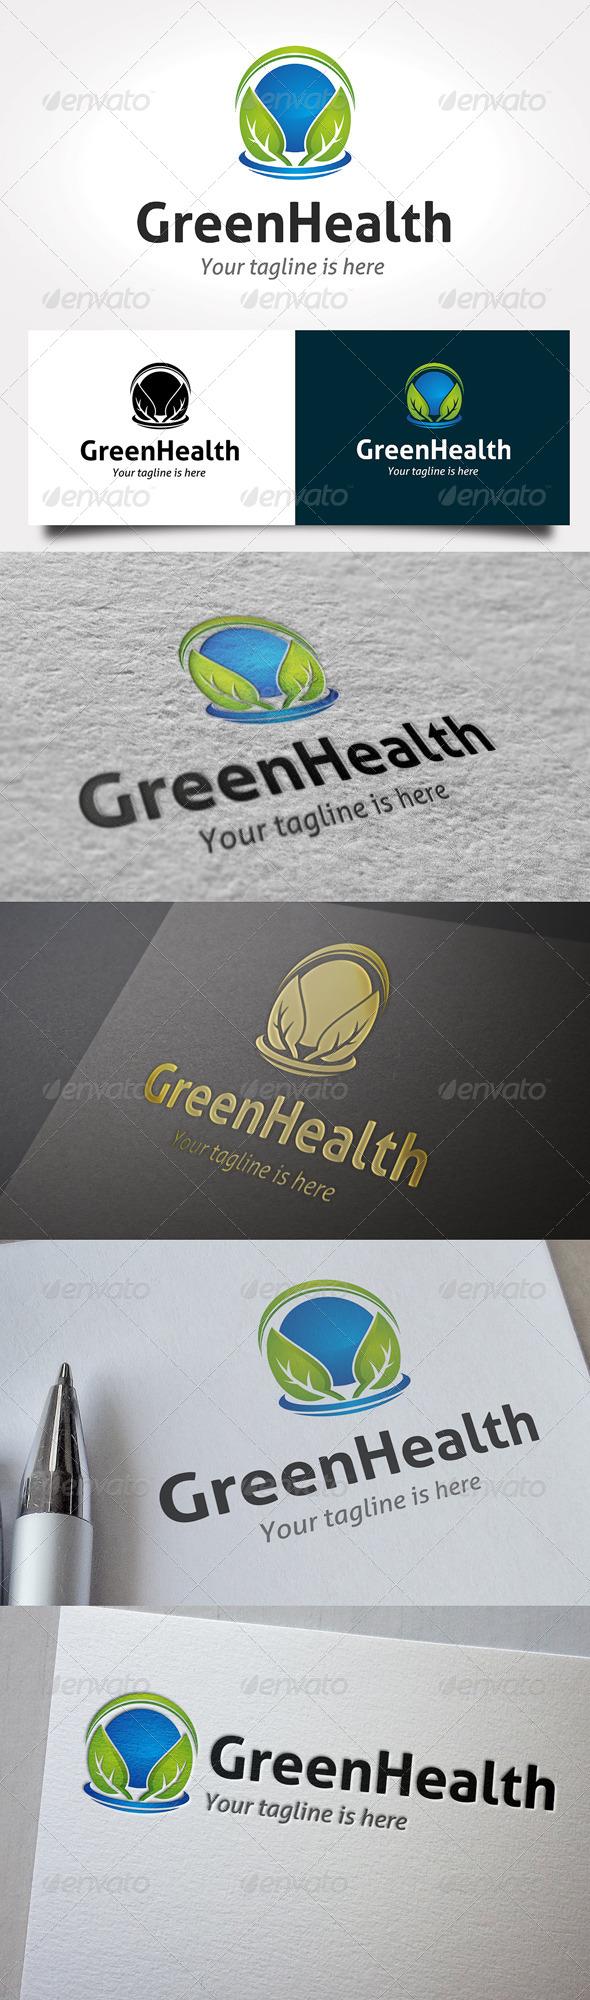 Green Health Logo - Nature Logo Templates